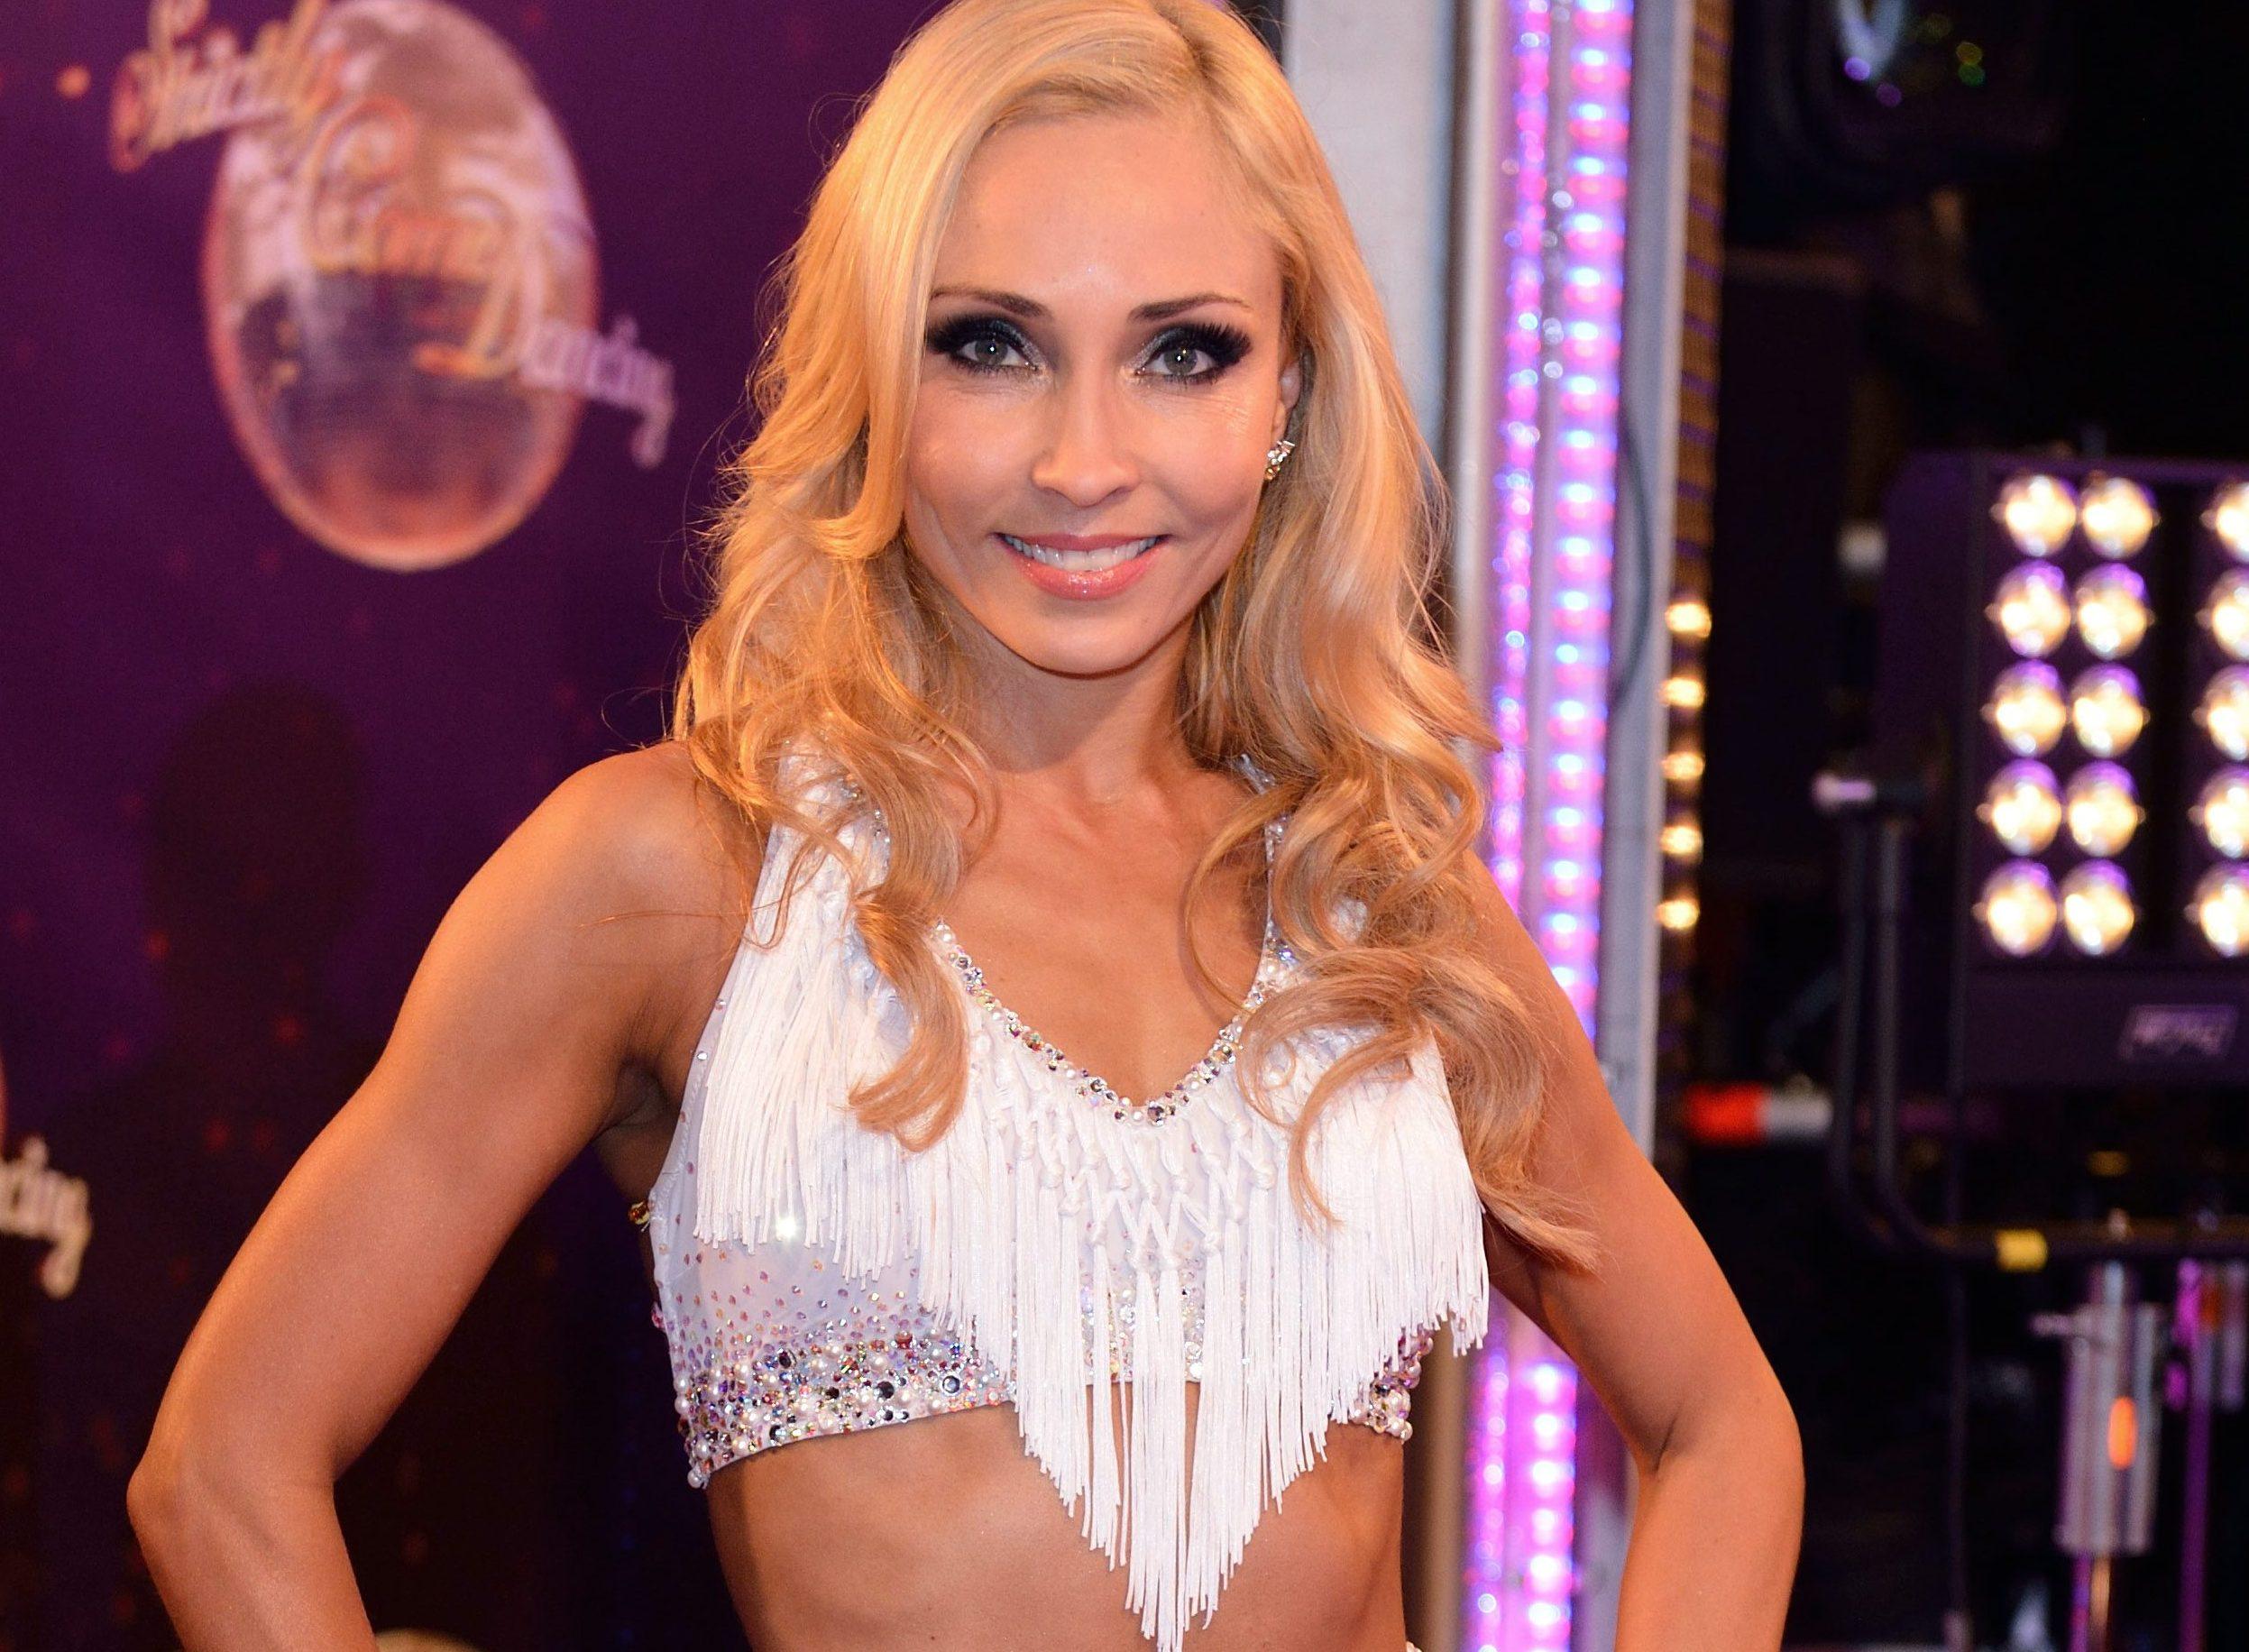 Former Strictly star Iveta Lukosiute